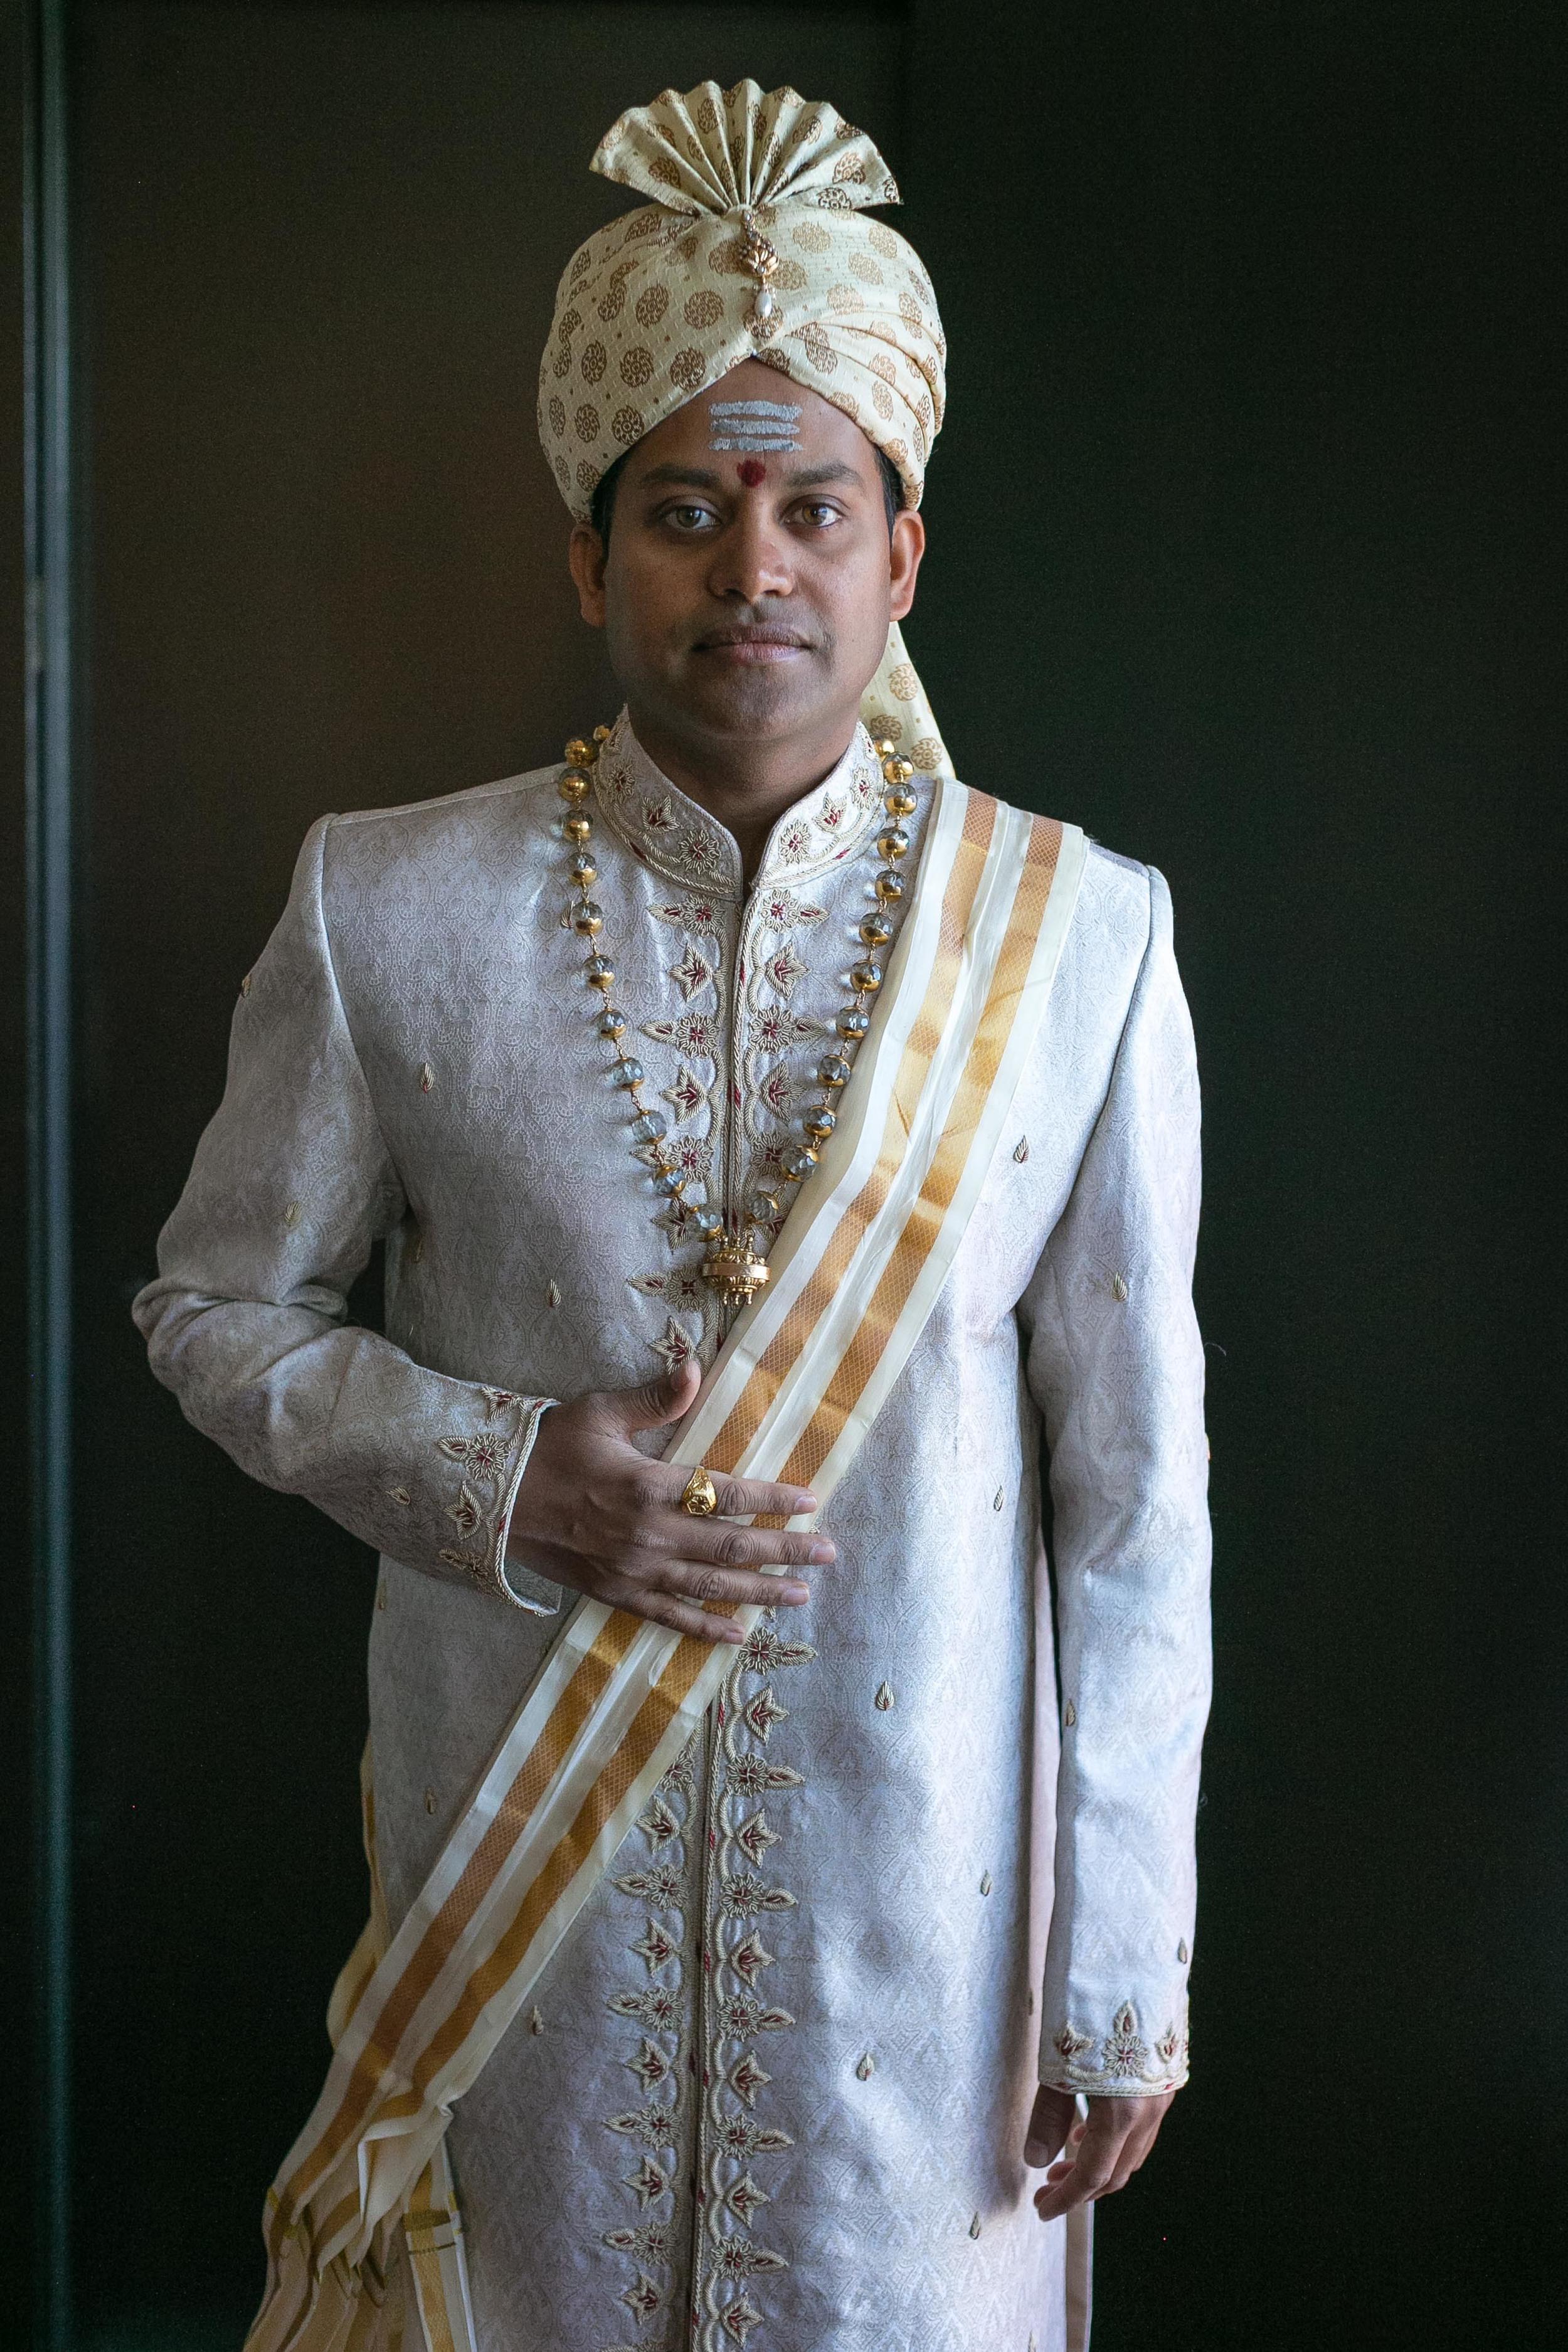 Luxurious-Indian-Wedding-Marriott-Boston-Massachusetts-Documentary-Wedding-Photography-by-Jacek-Dolata-5.jpg